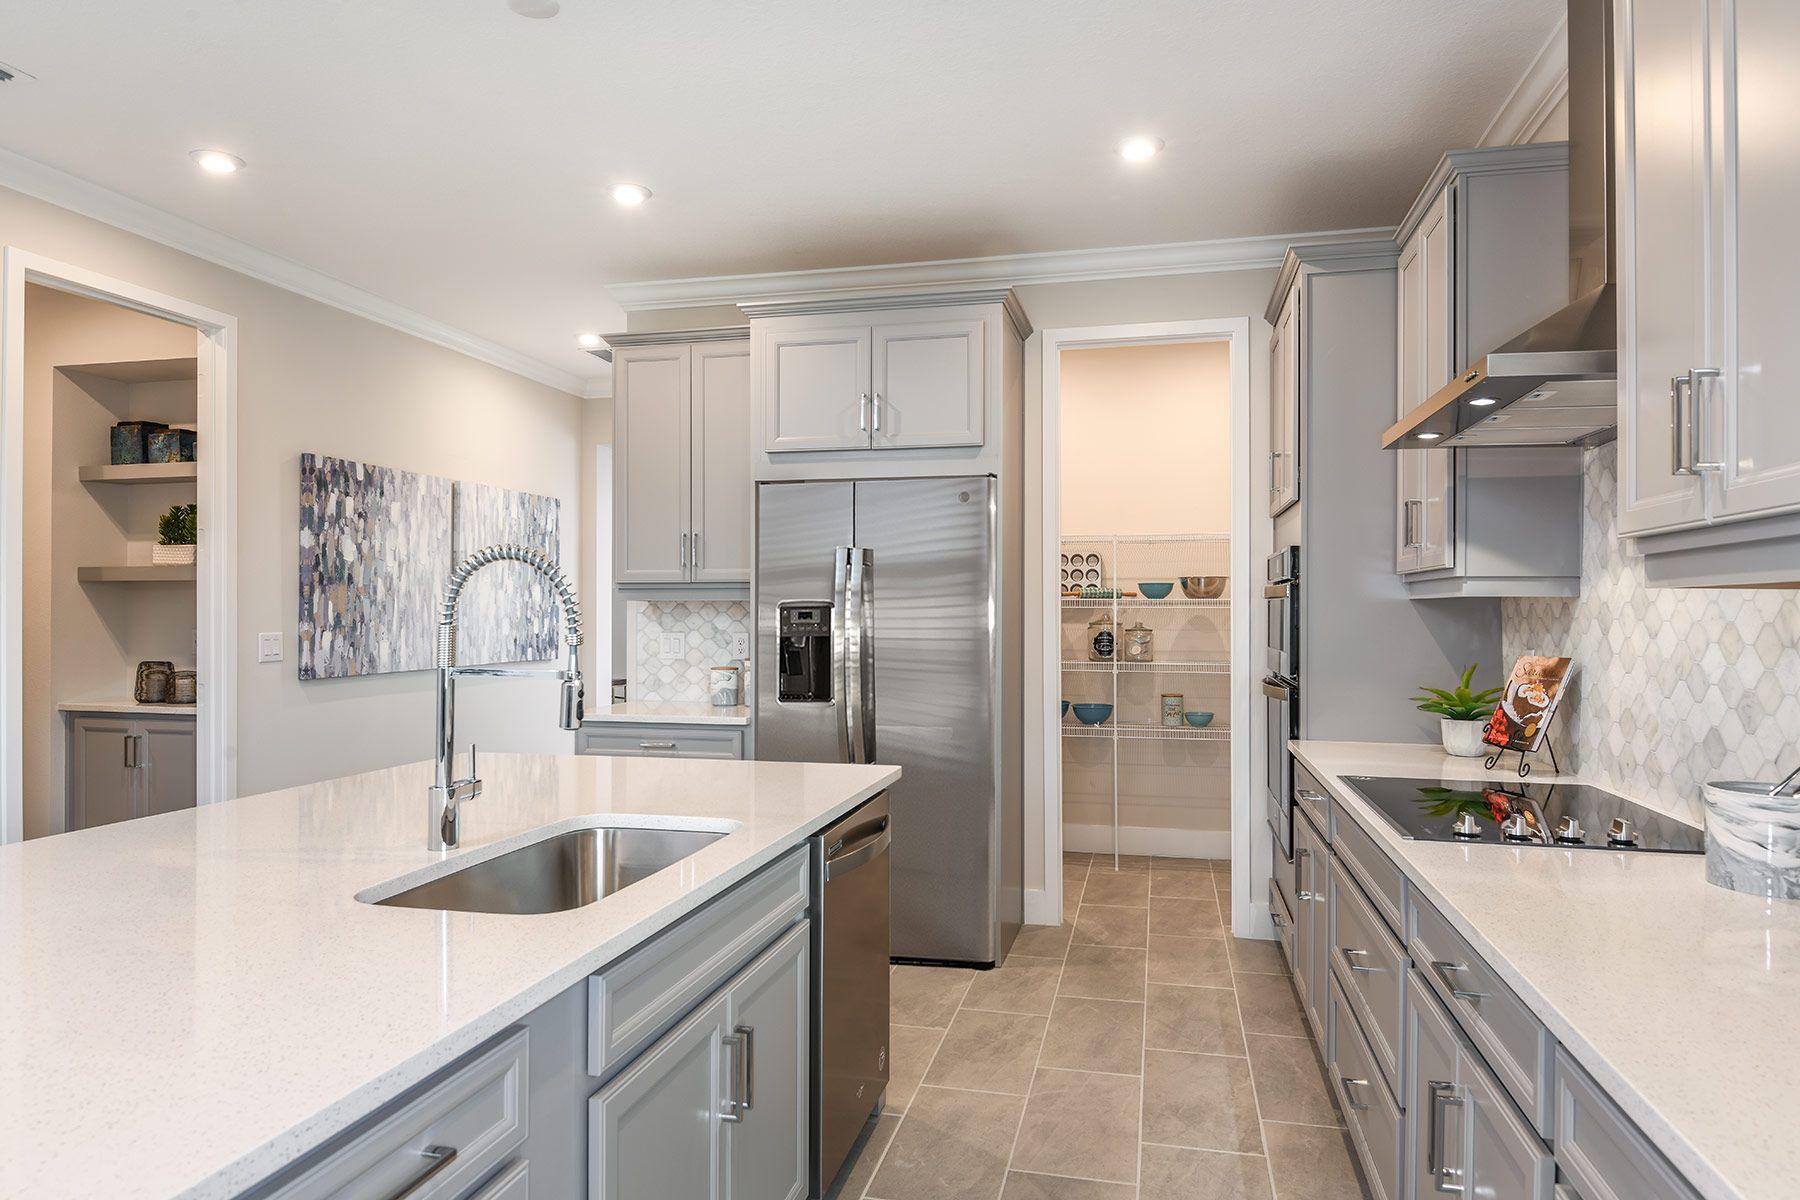 Kitchen featured in the Dominica II By Mattamy Homes in Sarasota-Bradenton, FL